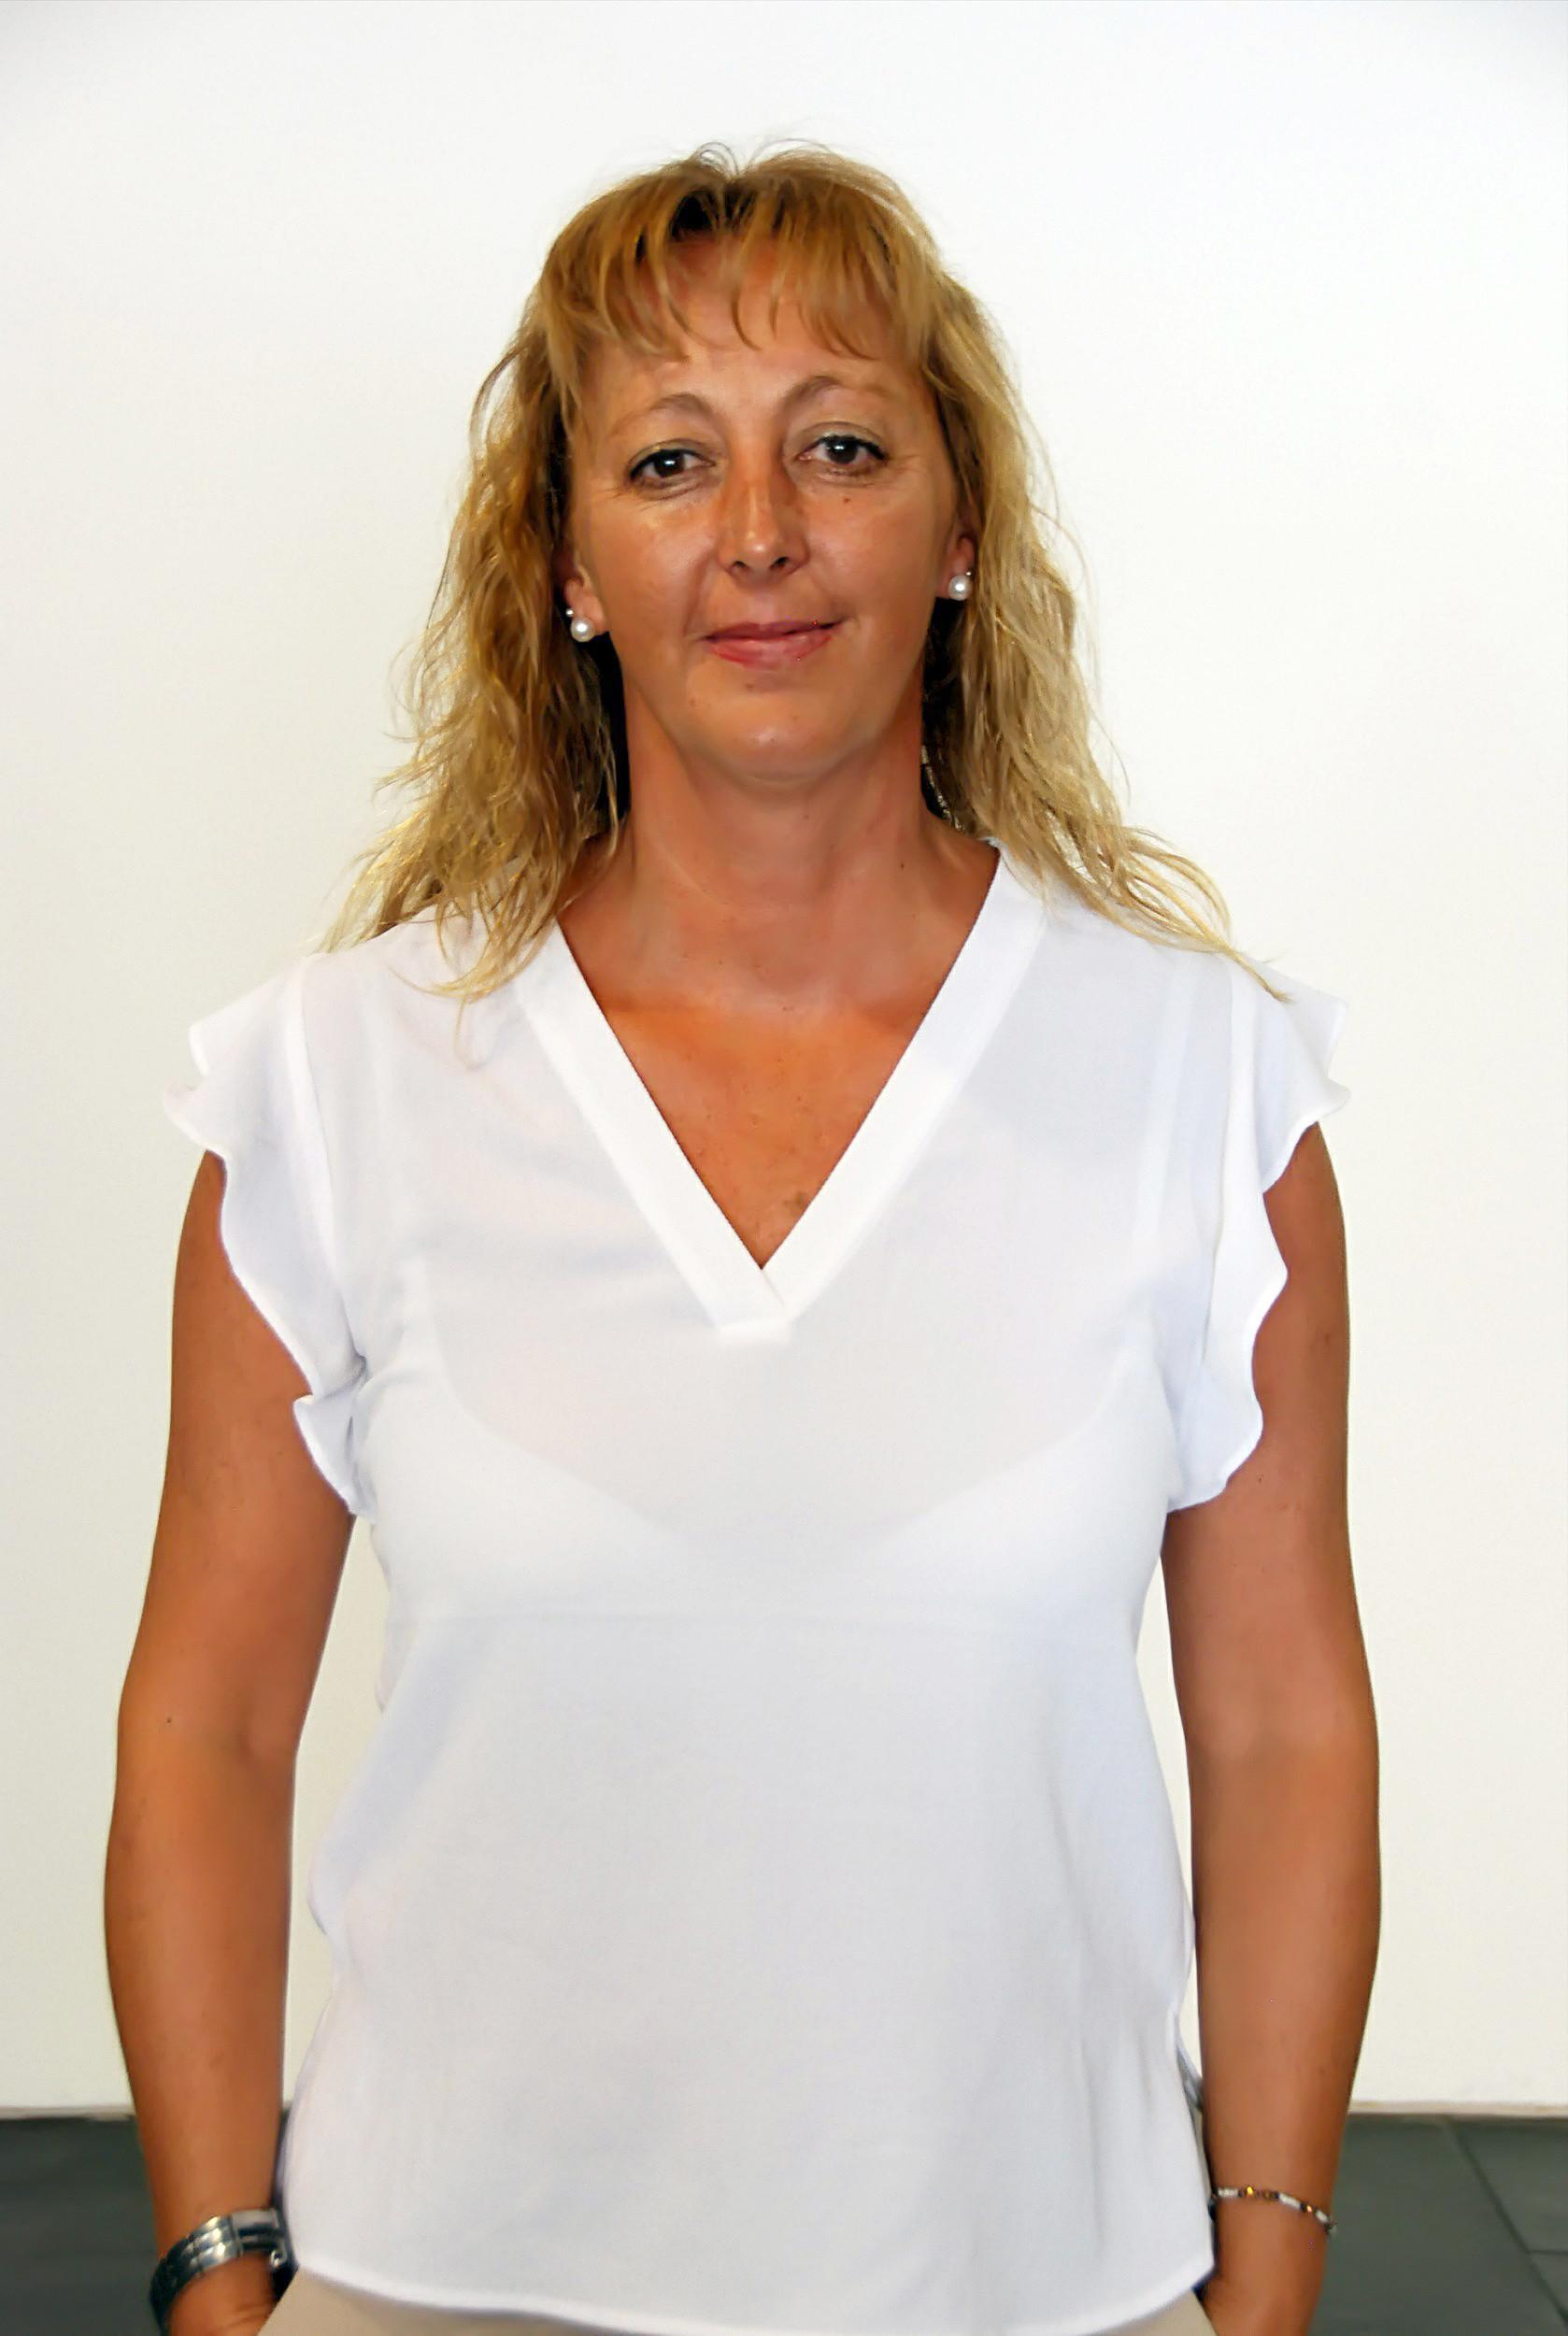 Pilar Moreno de la Chica